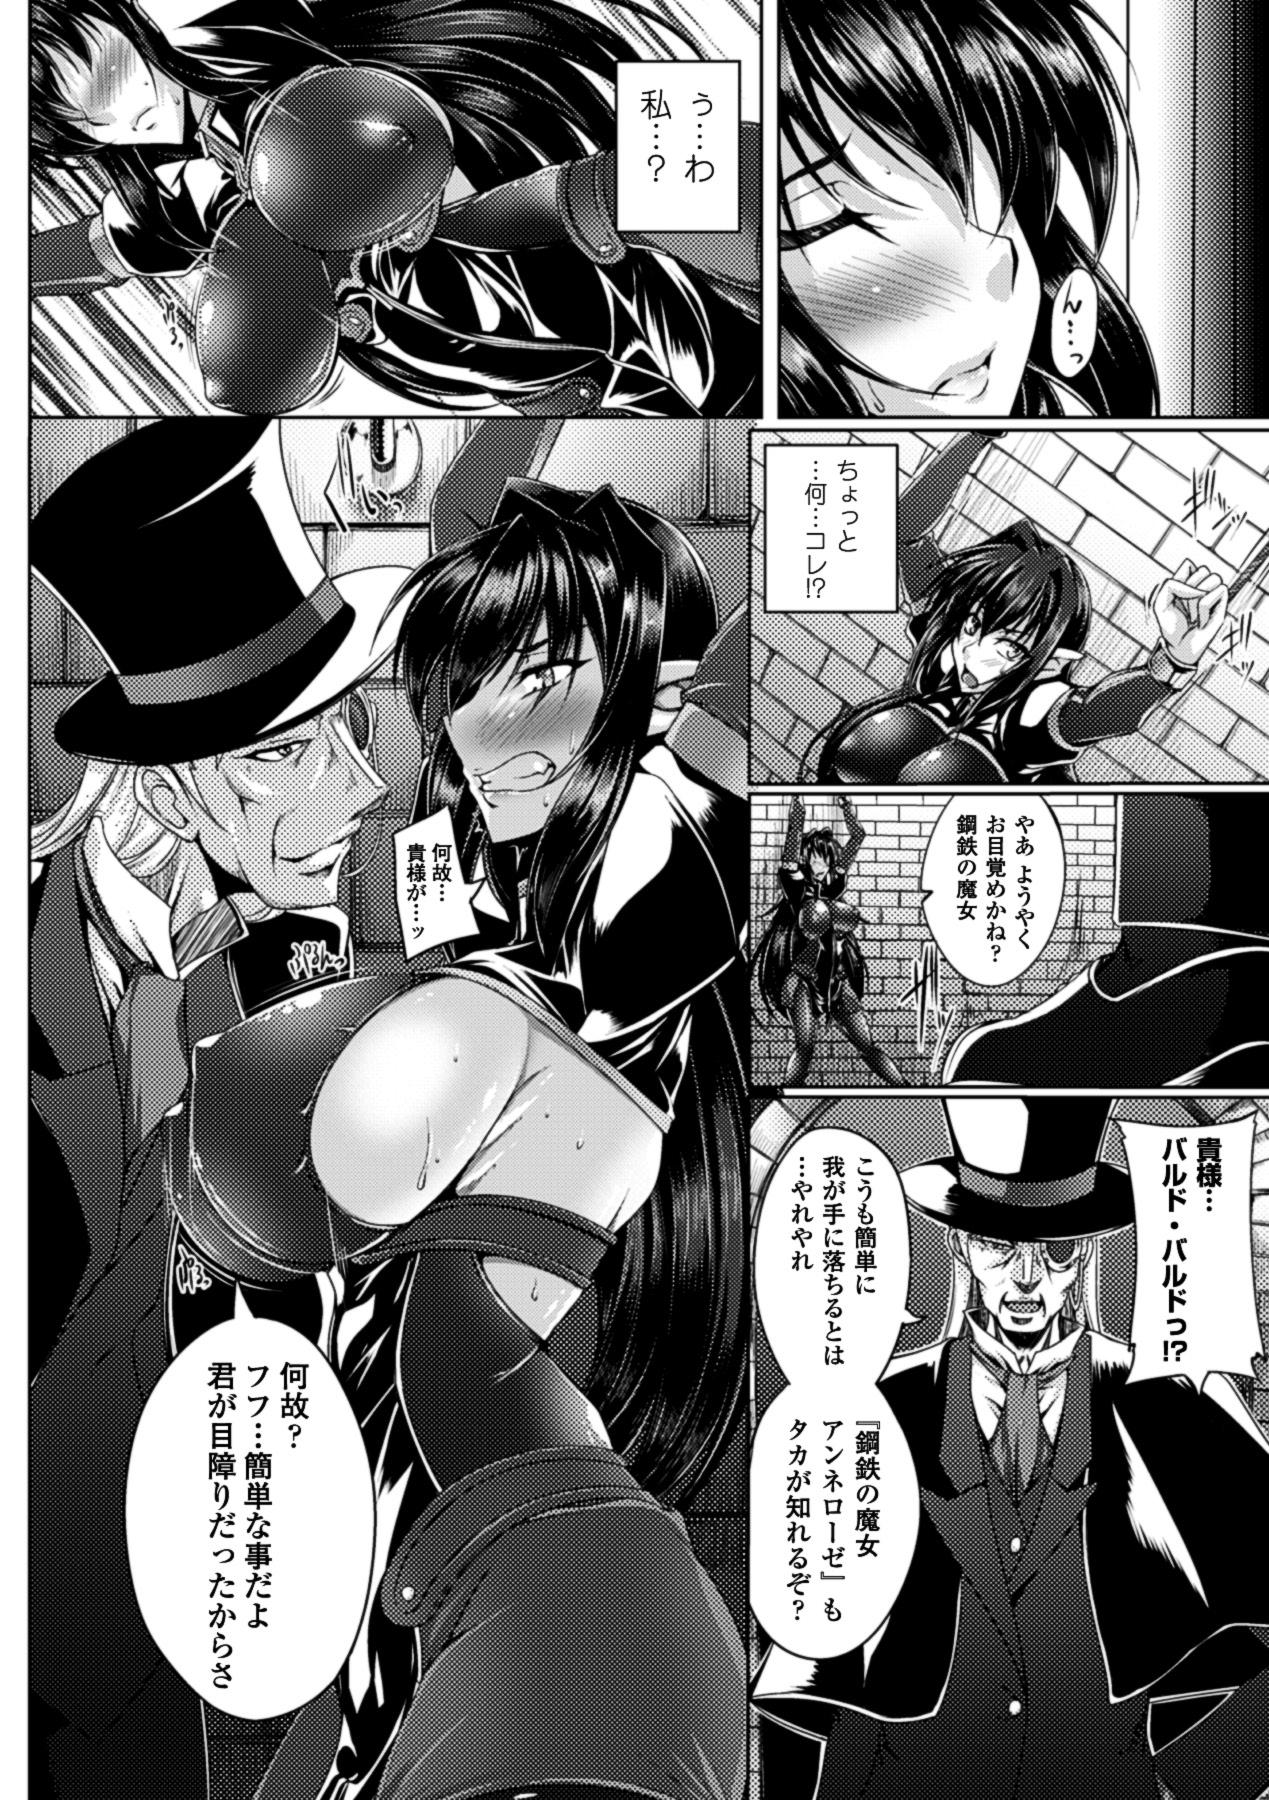 Megami Crisis 10 9